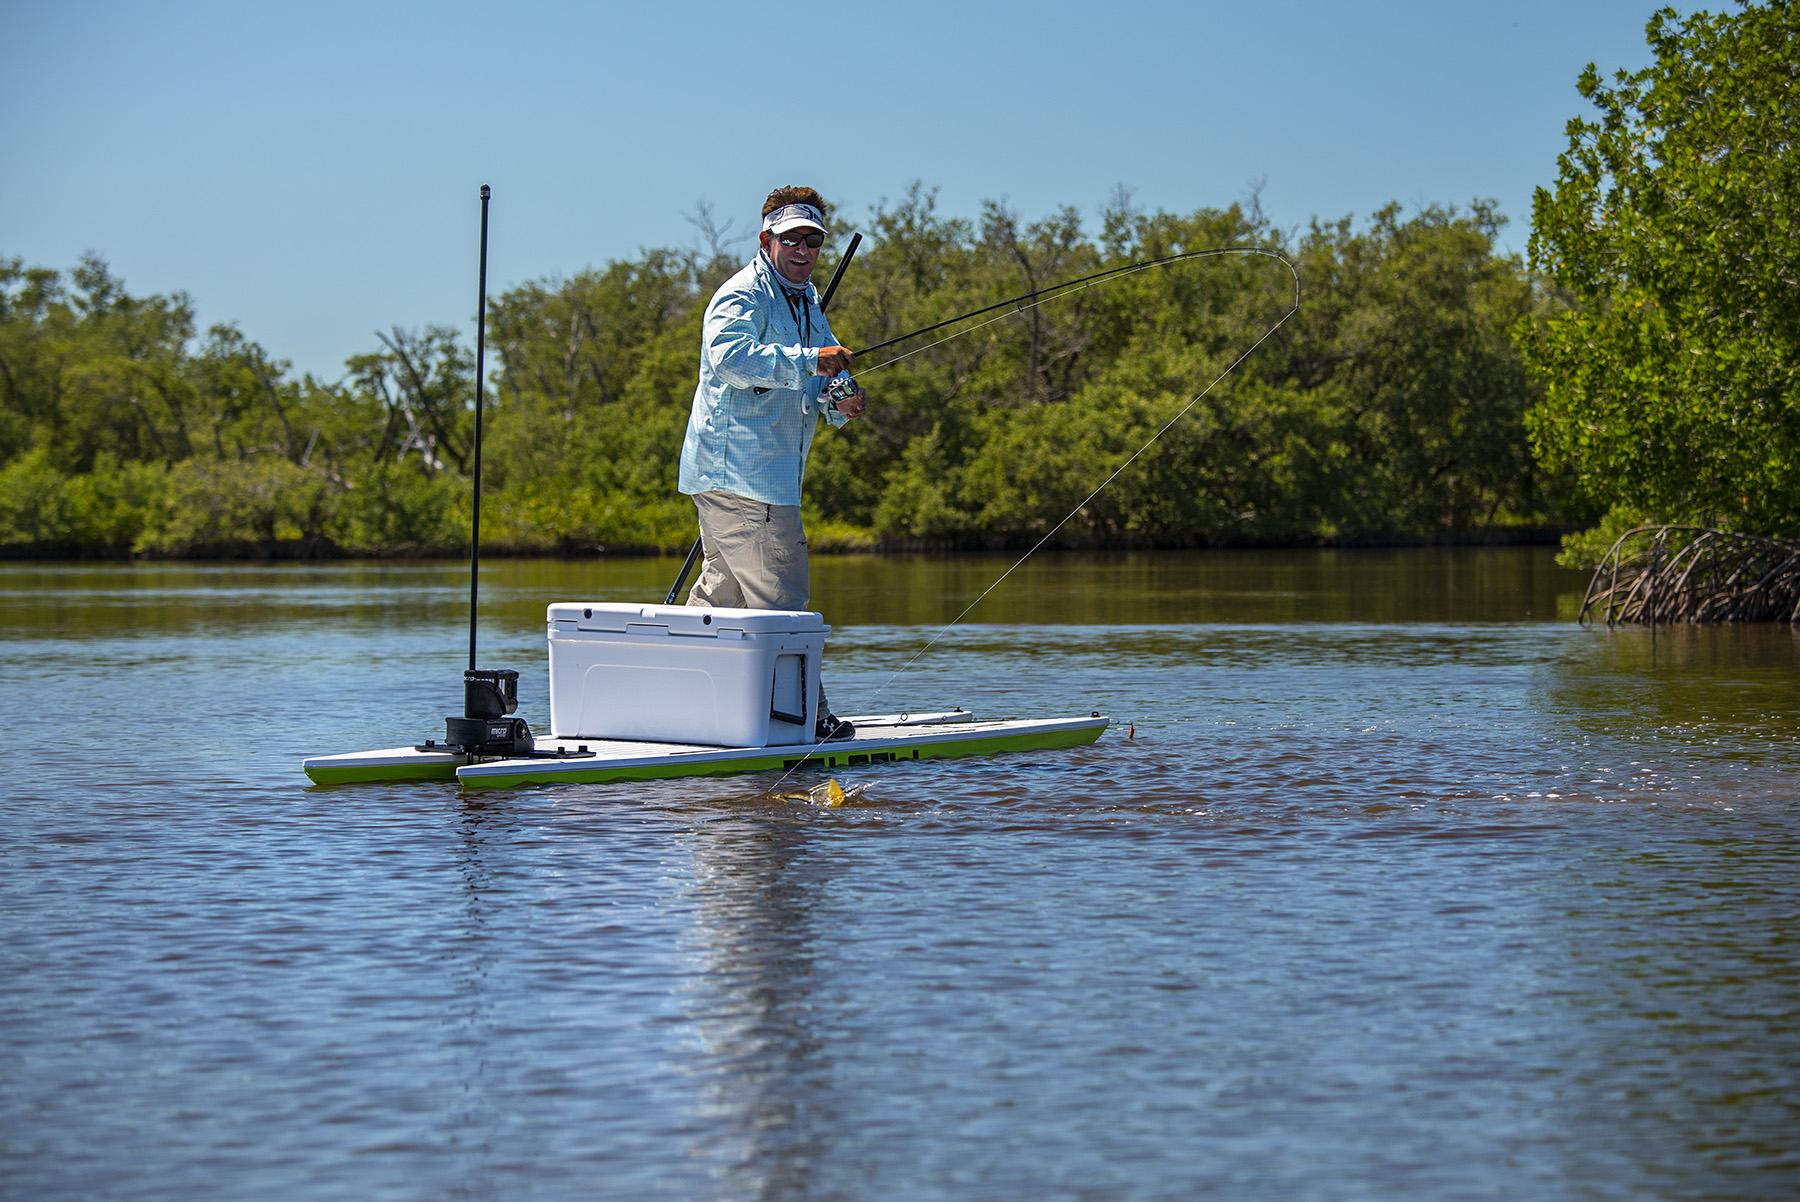 Livewatersports L2Fish paddle board